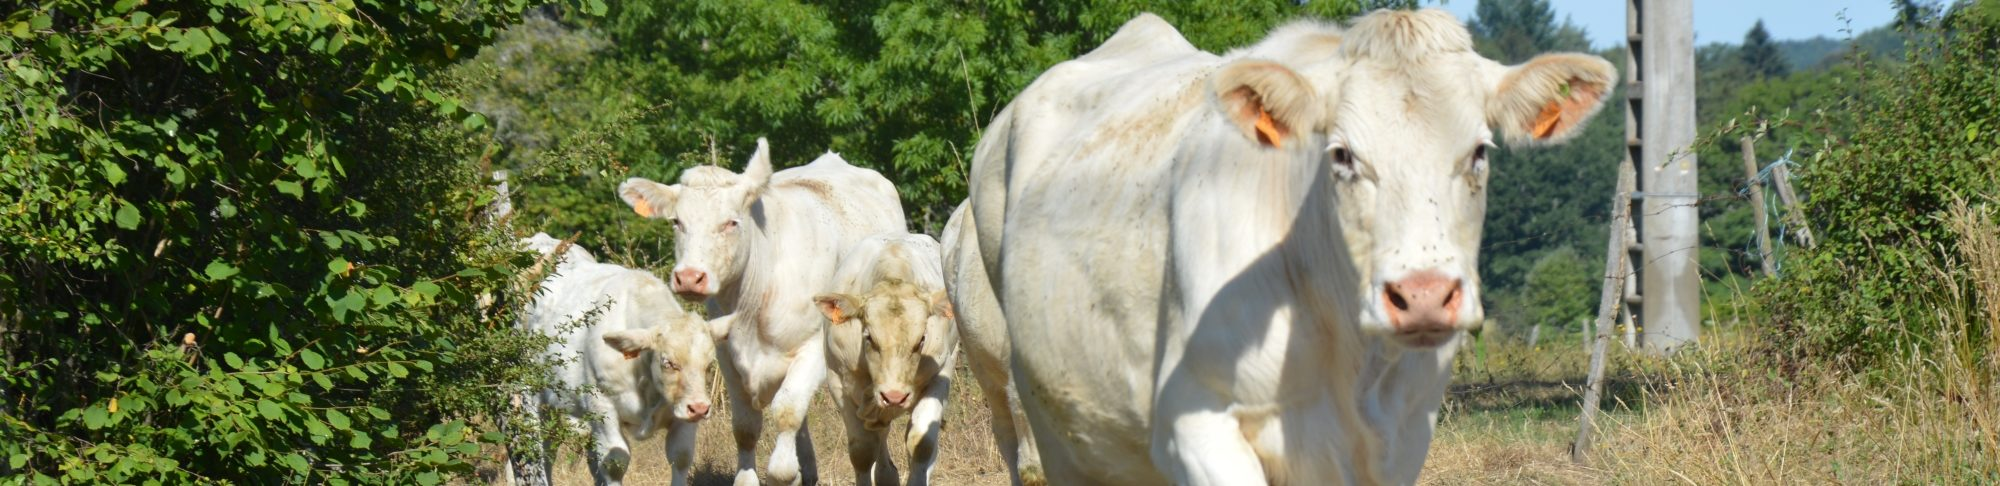 defile de vache